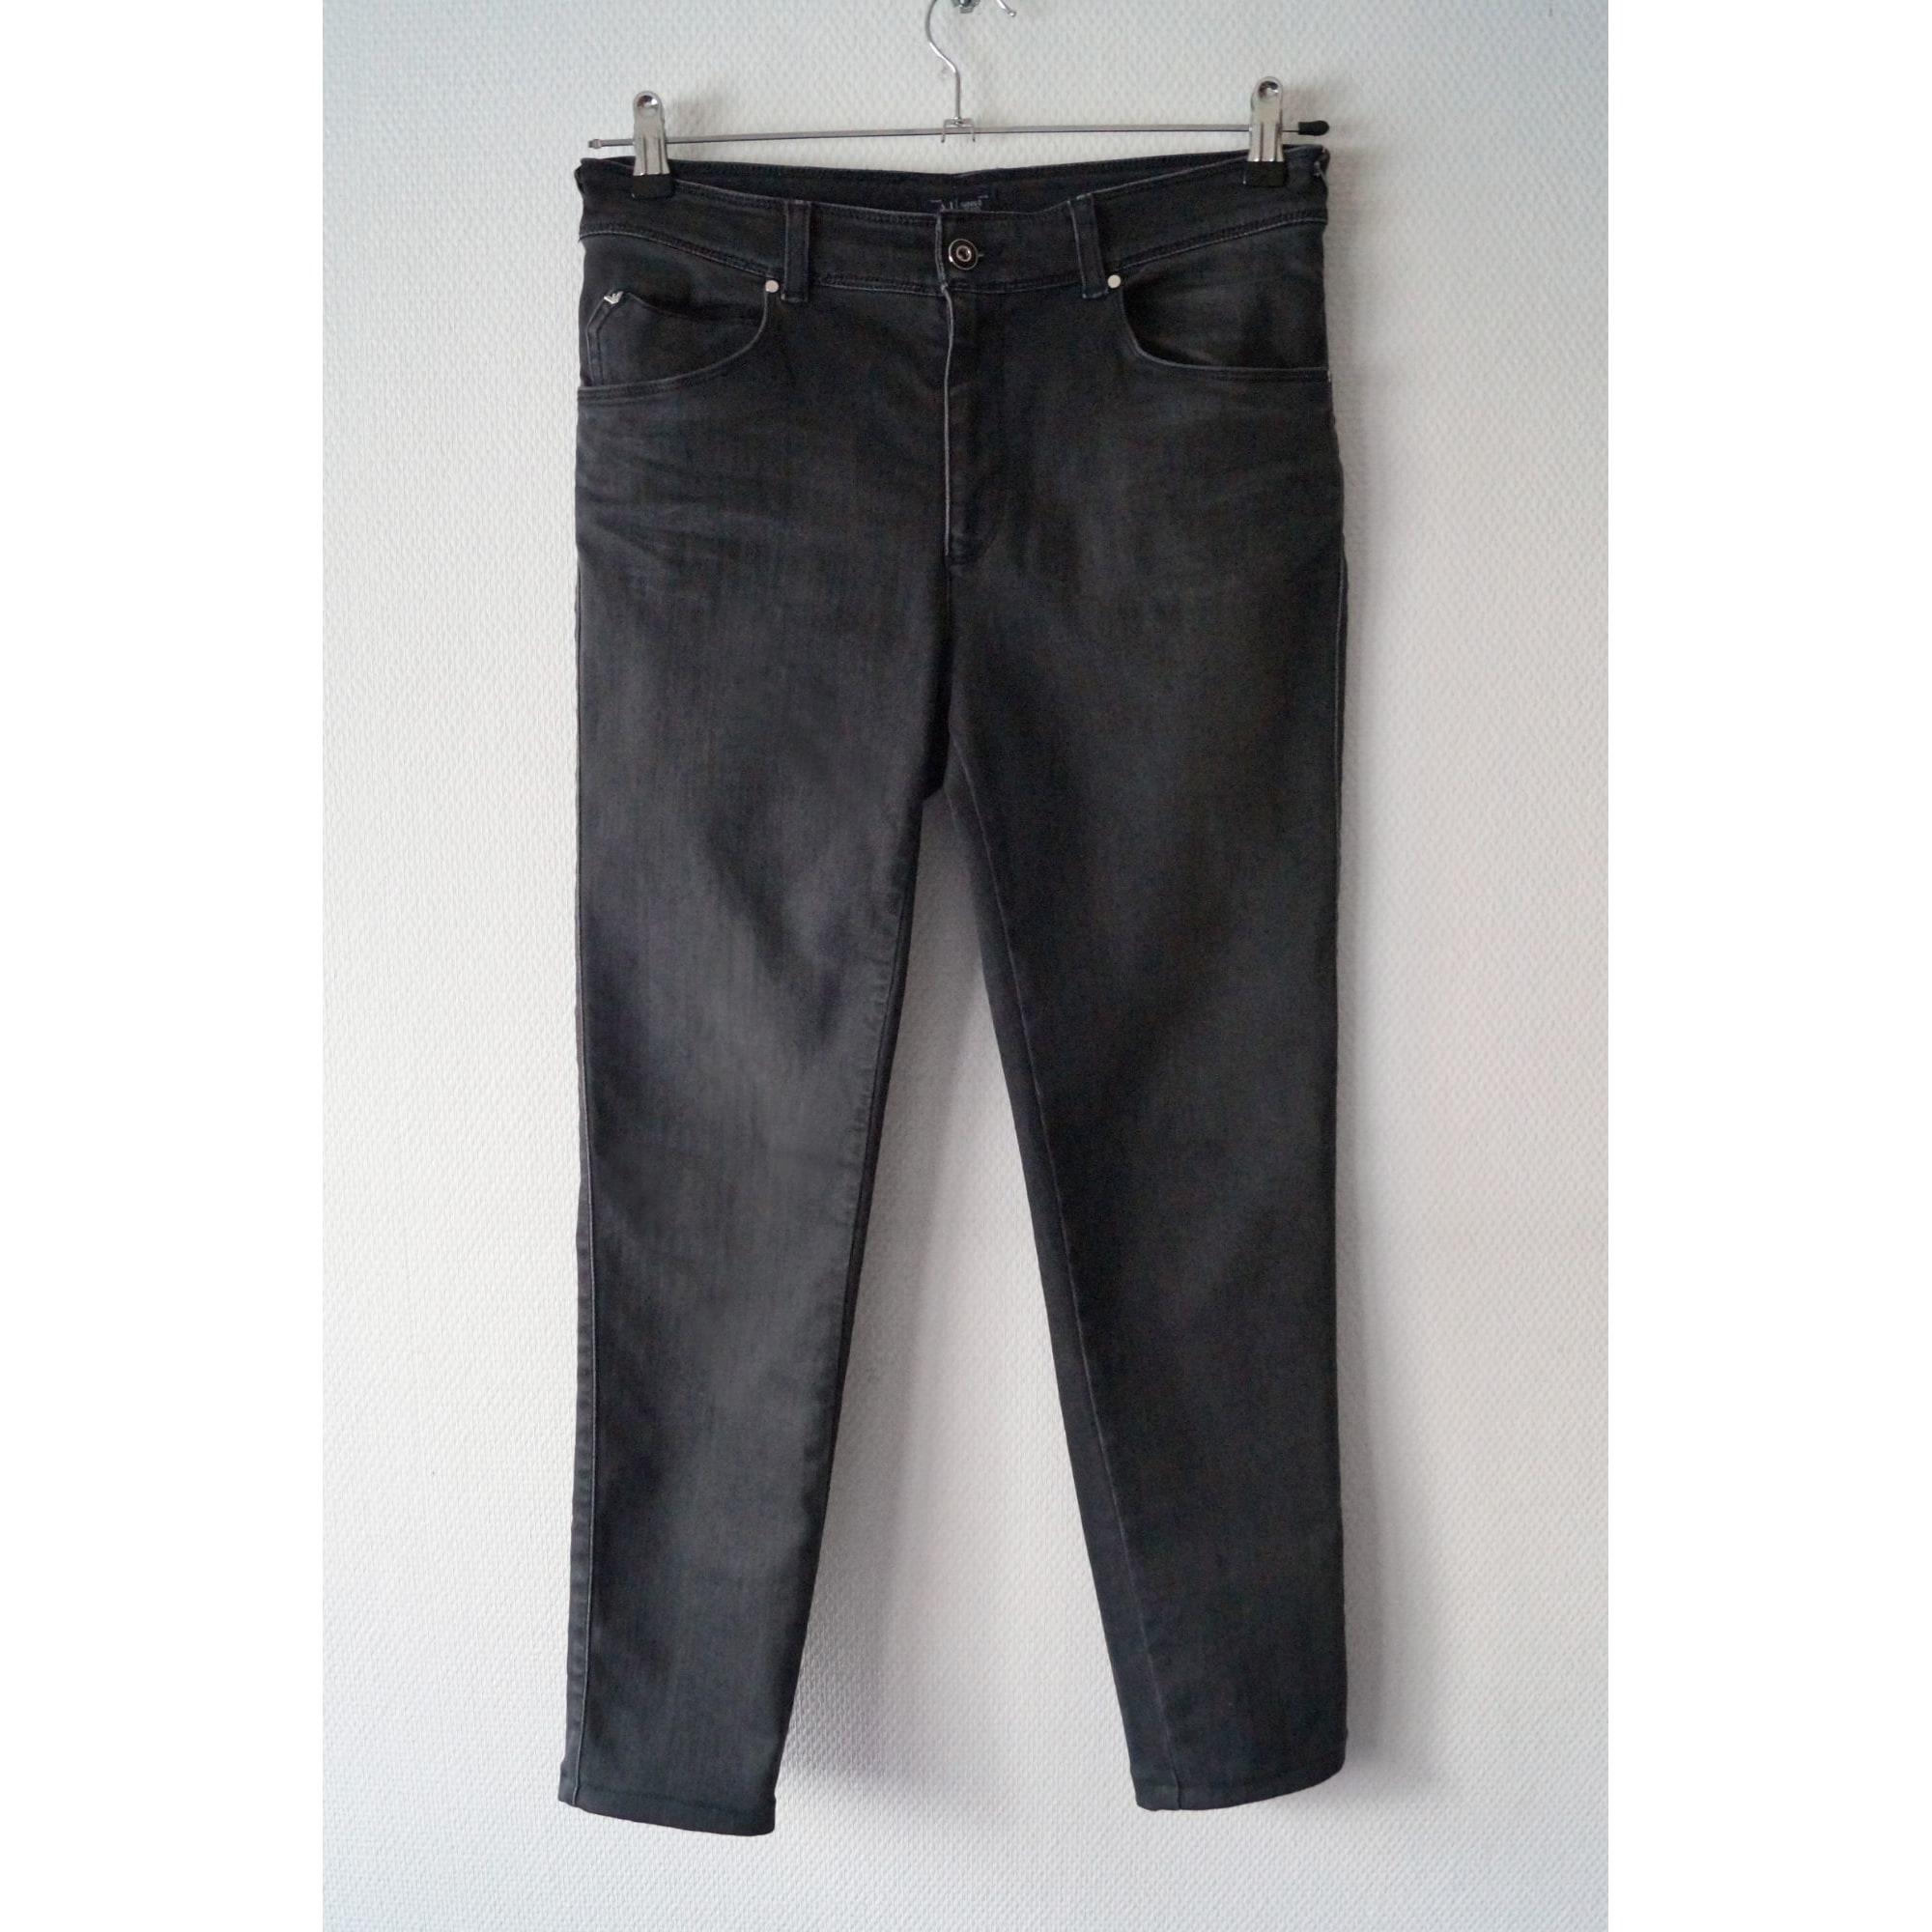 Jeans slim ARMANI JEANS Gris, anthracite